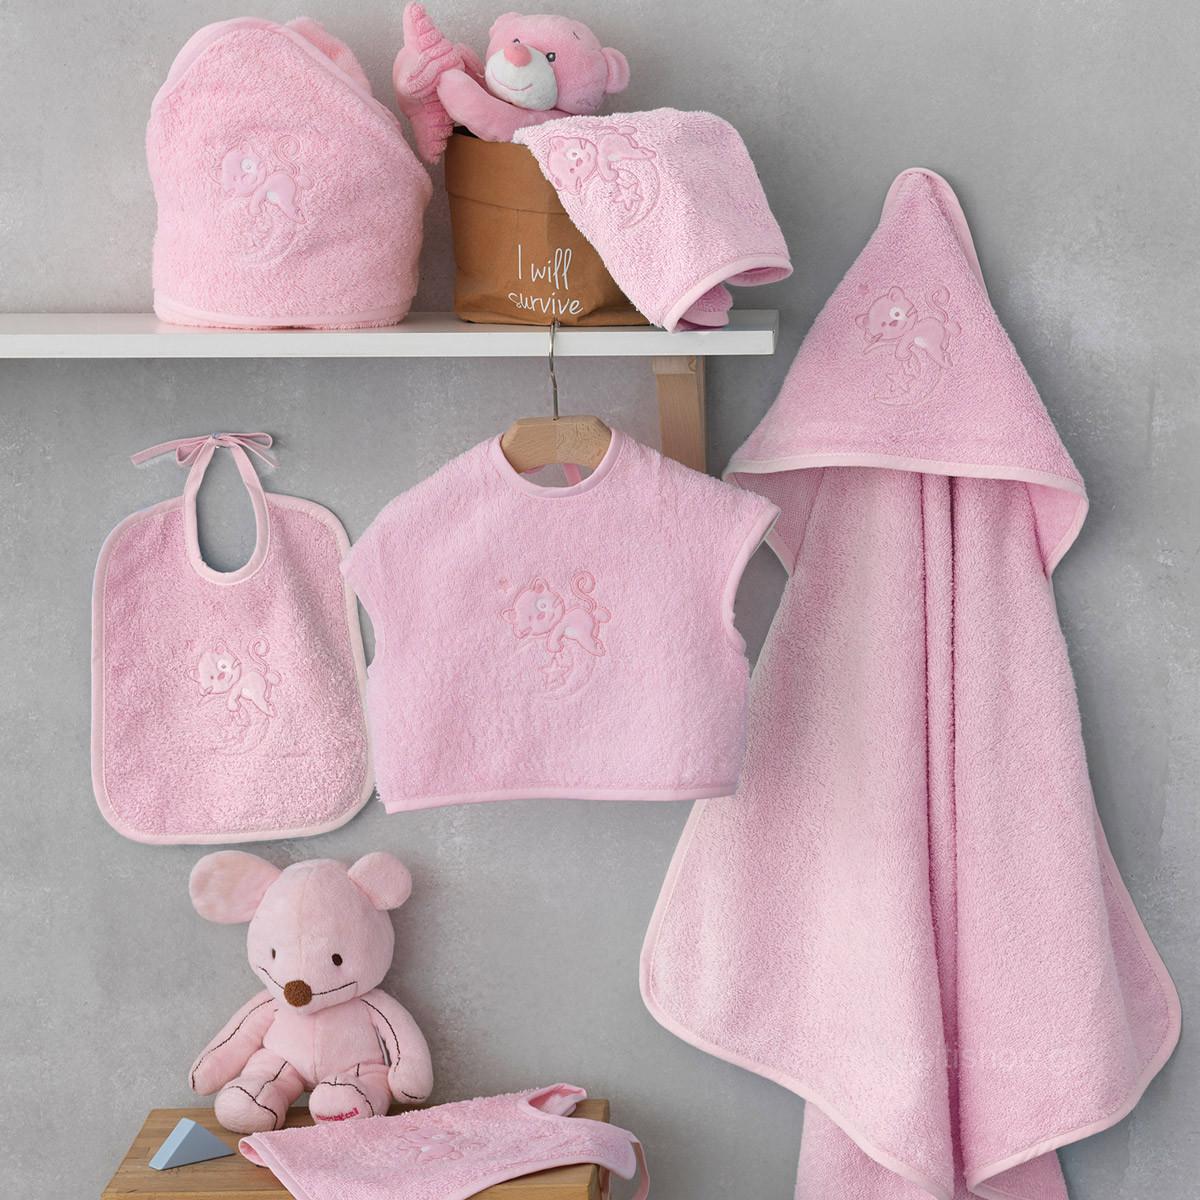 e9564dfc5df SpitiShop Βρεφικό Σετ Λουτρού Palamaiki Baby Joia 562 Pink